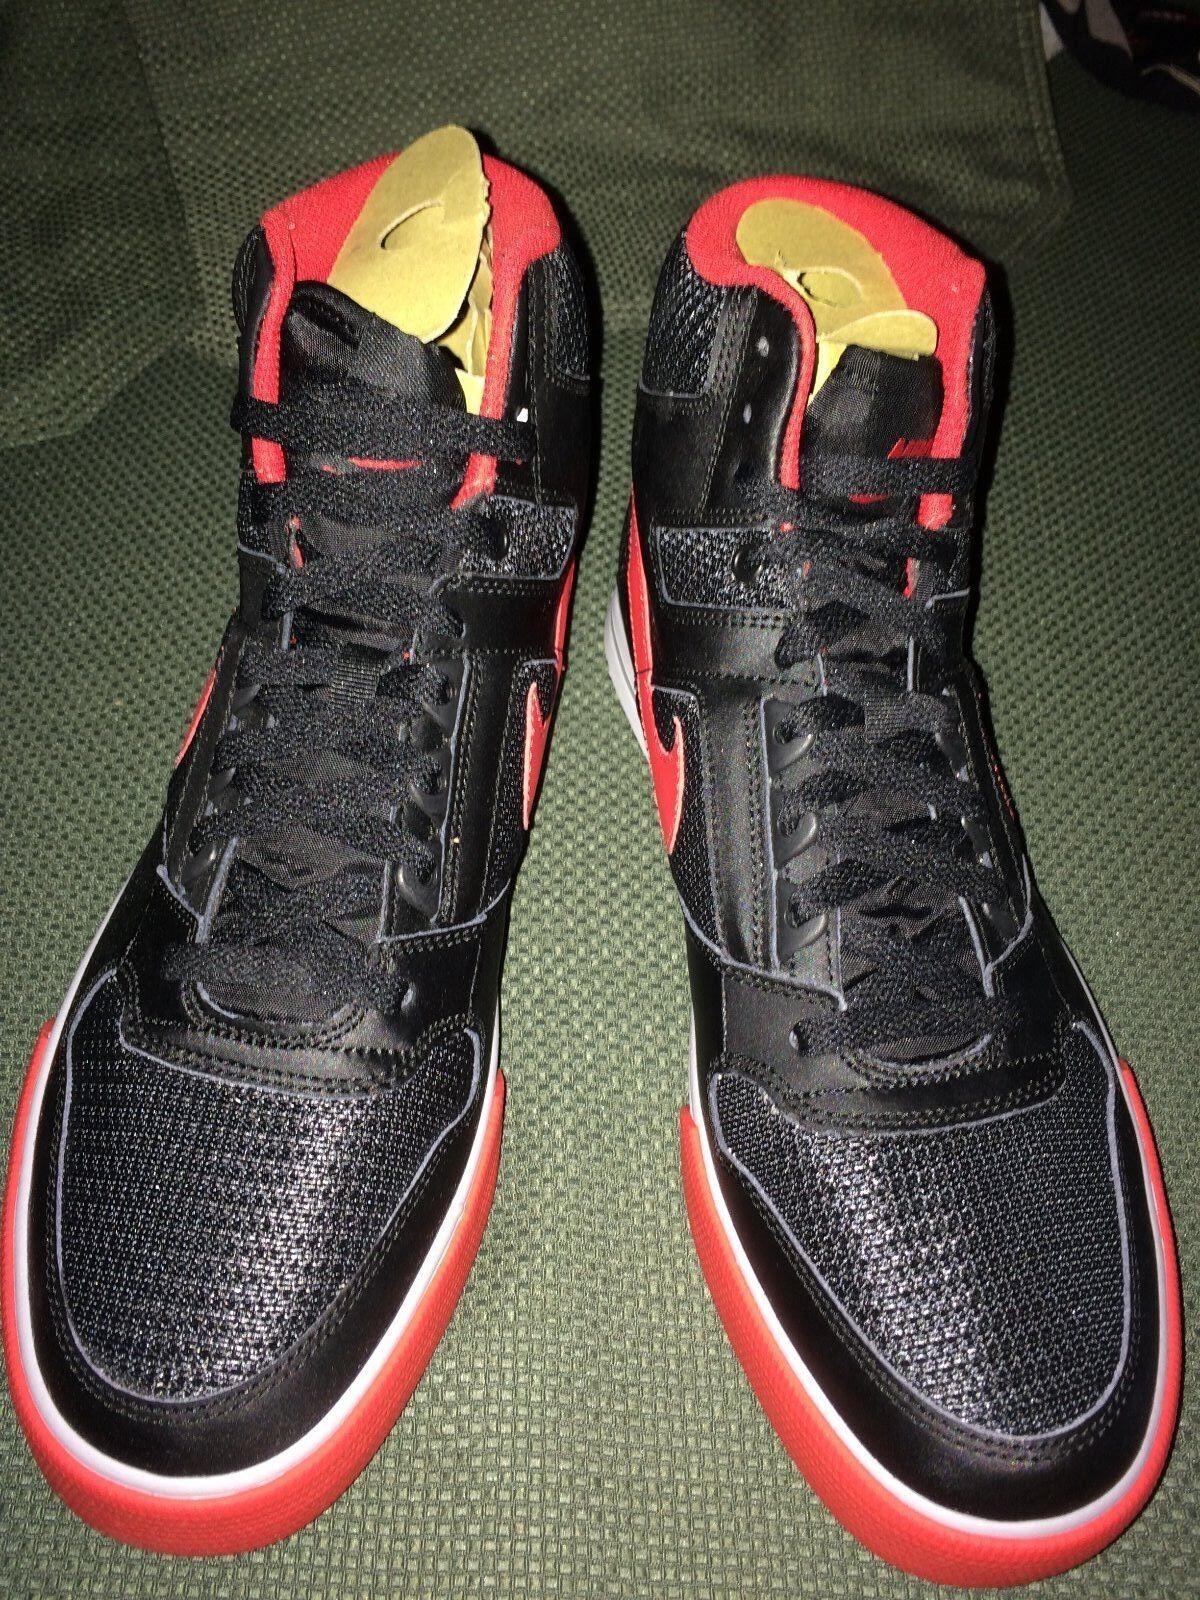 Seltene nike delta force force force hohe ac schwarz - rot - basketball - schuhe größe 11. jahrgang 833759